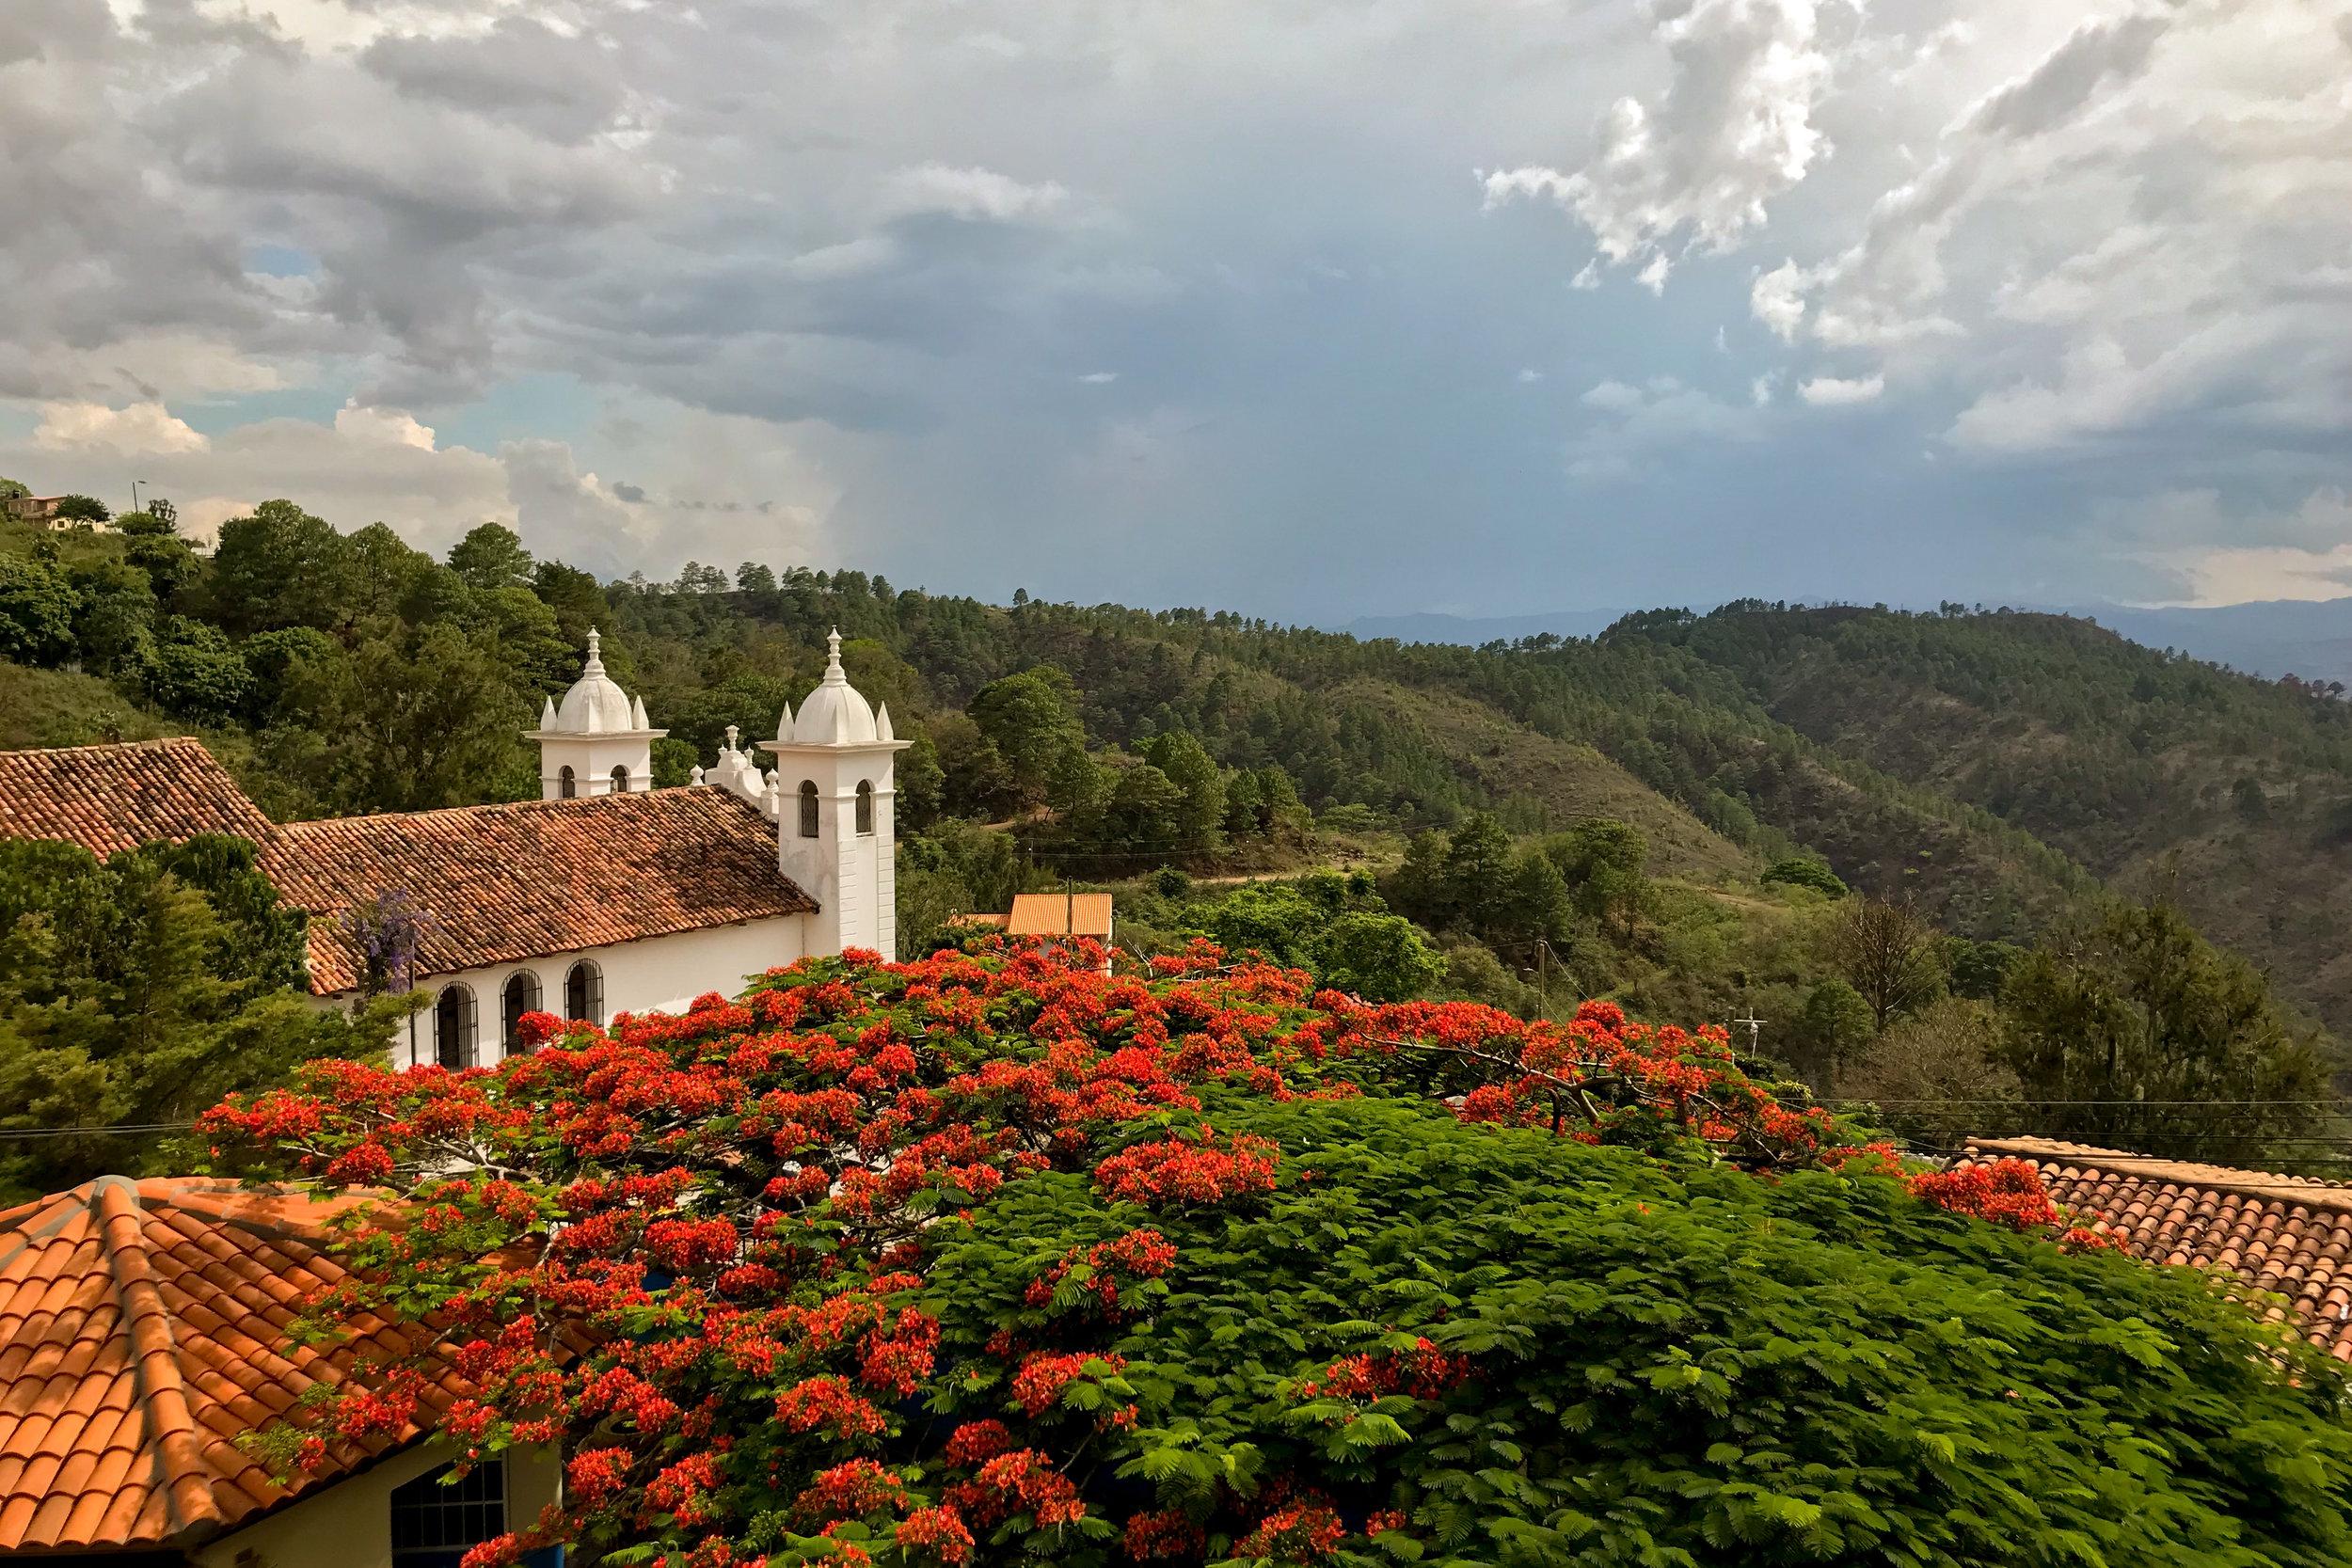 Honduras travel visit honduras Air Water or Land Angel Verde AWOL TV TRAVEL SHOW - Santa Lucia Tegucigalpa